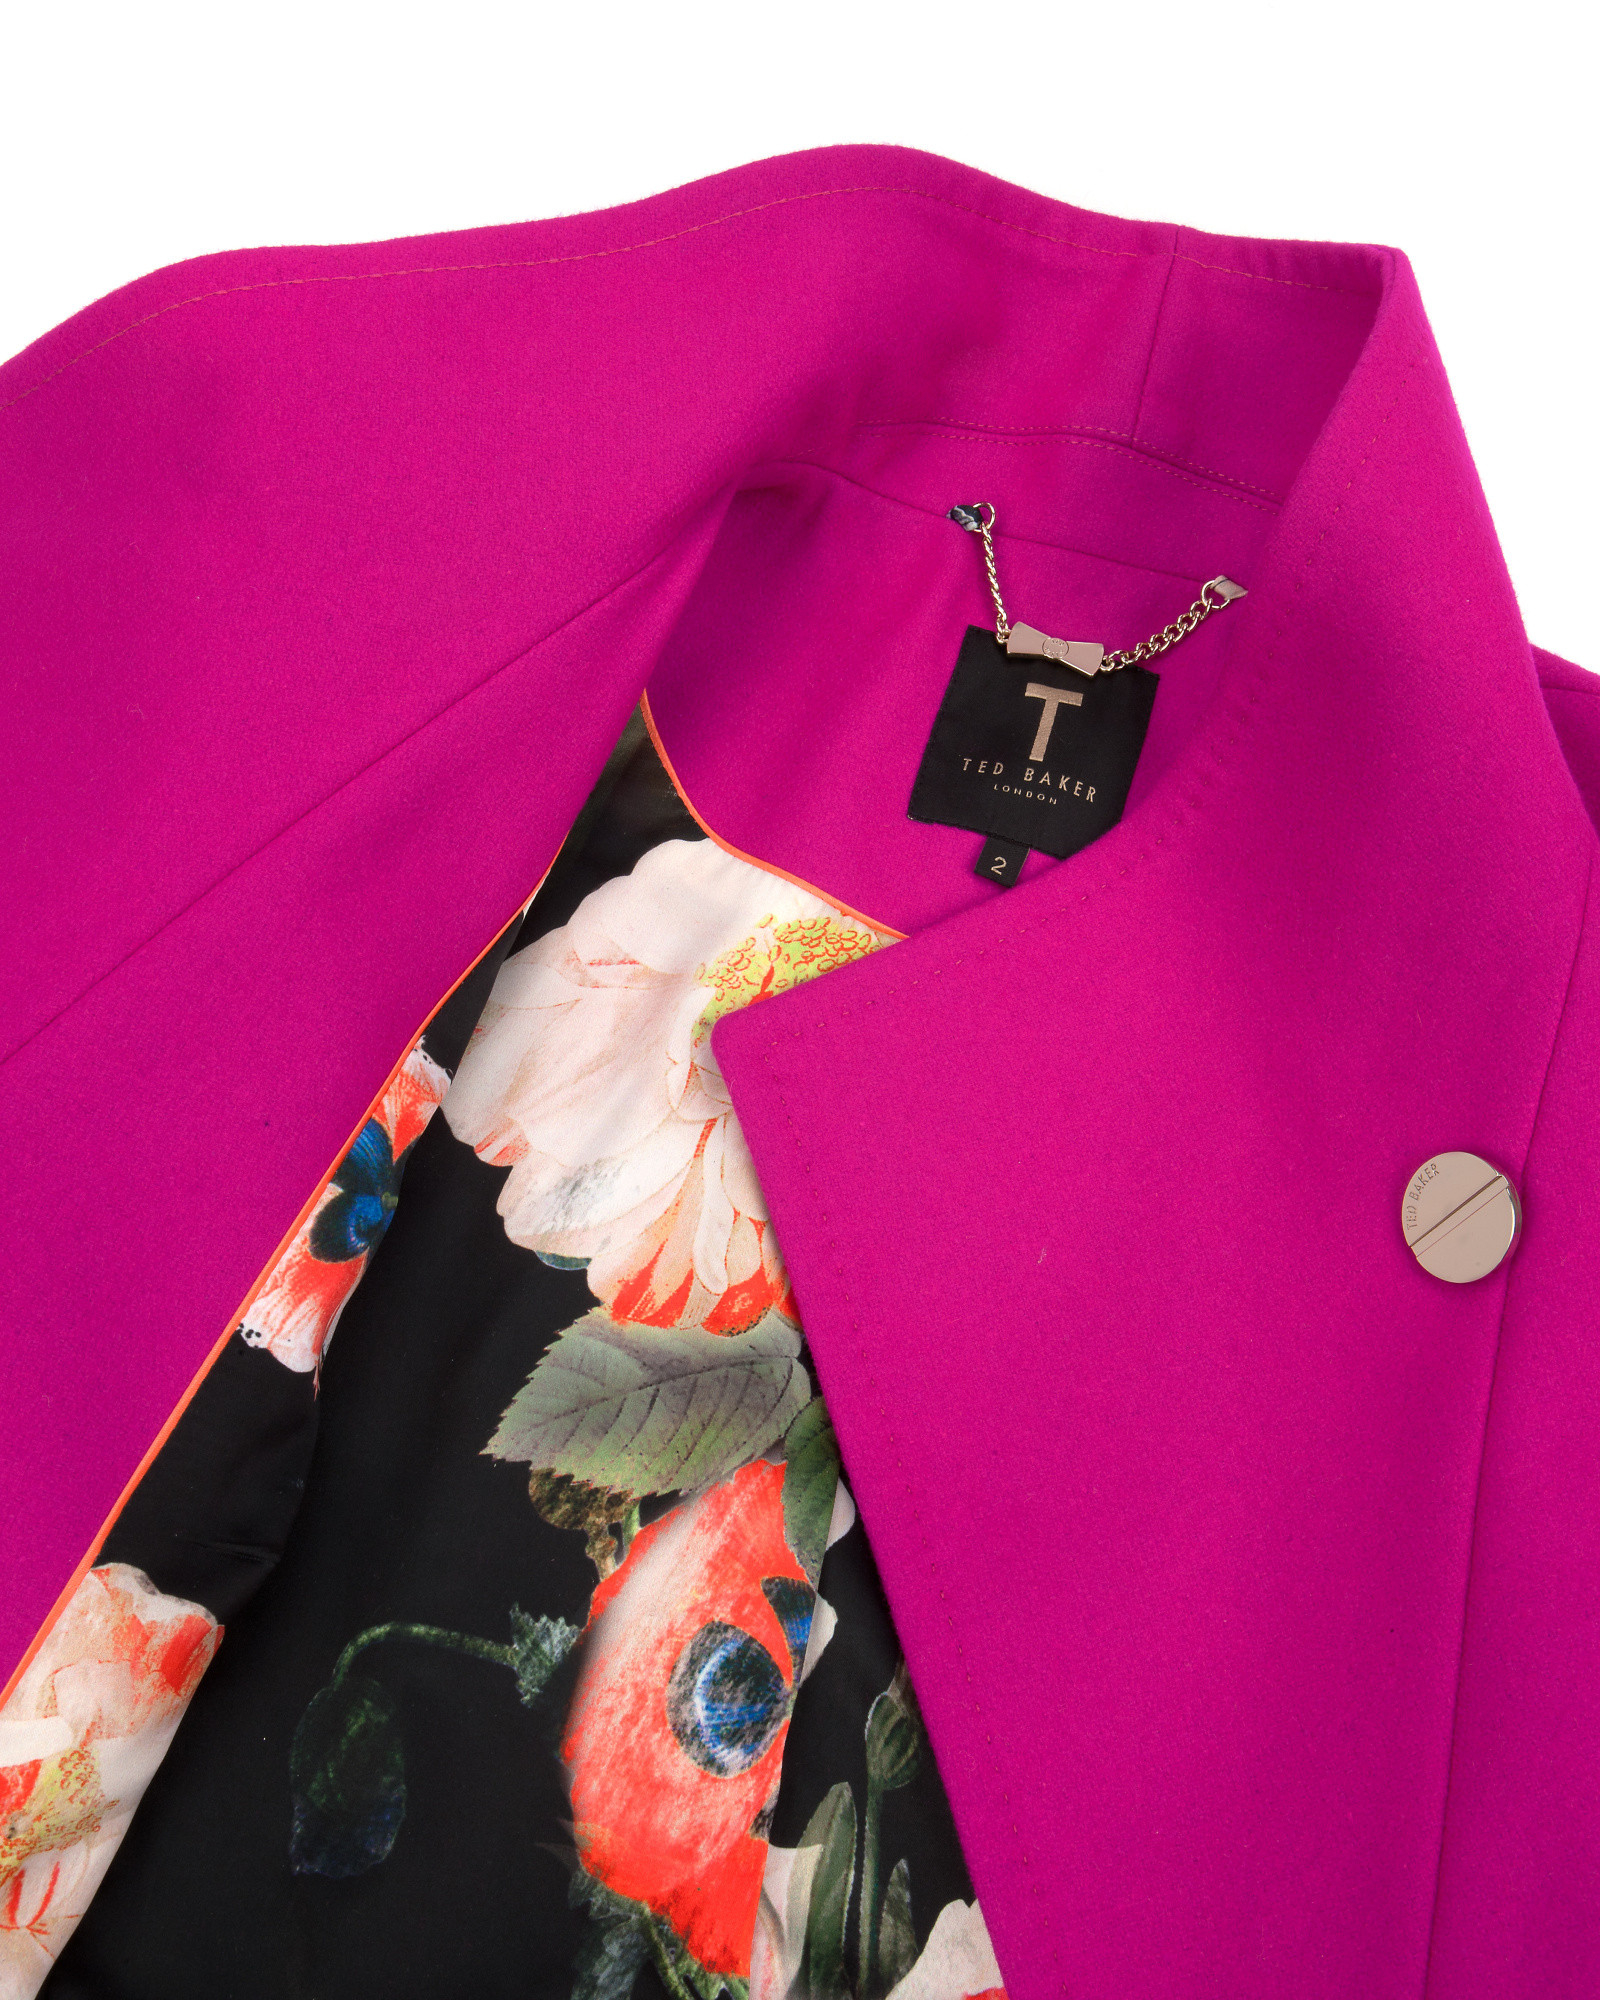 c5539d1d2ebd24 Lyst - Ted Baker Belted Wrap Coat in Pink